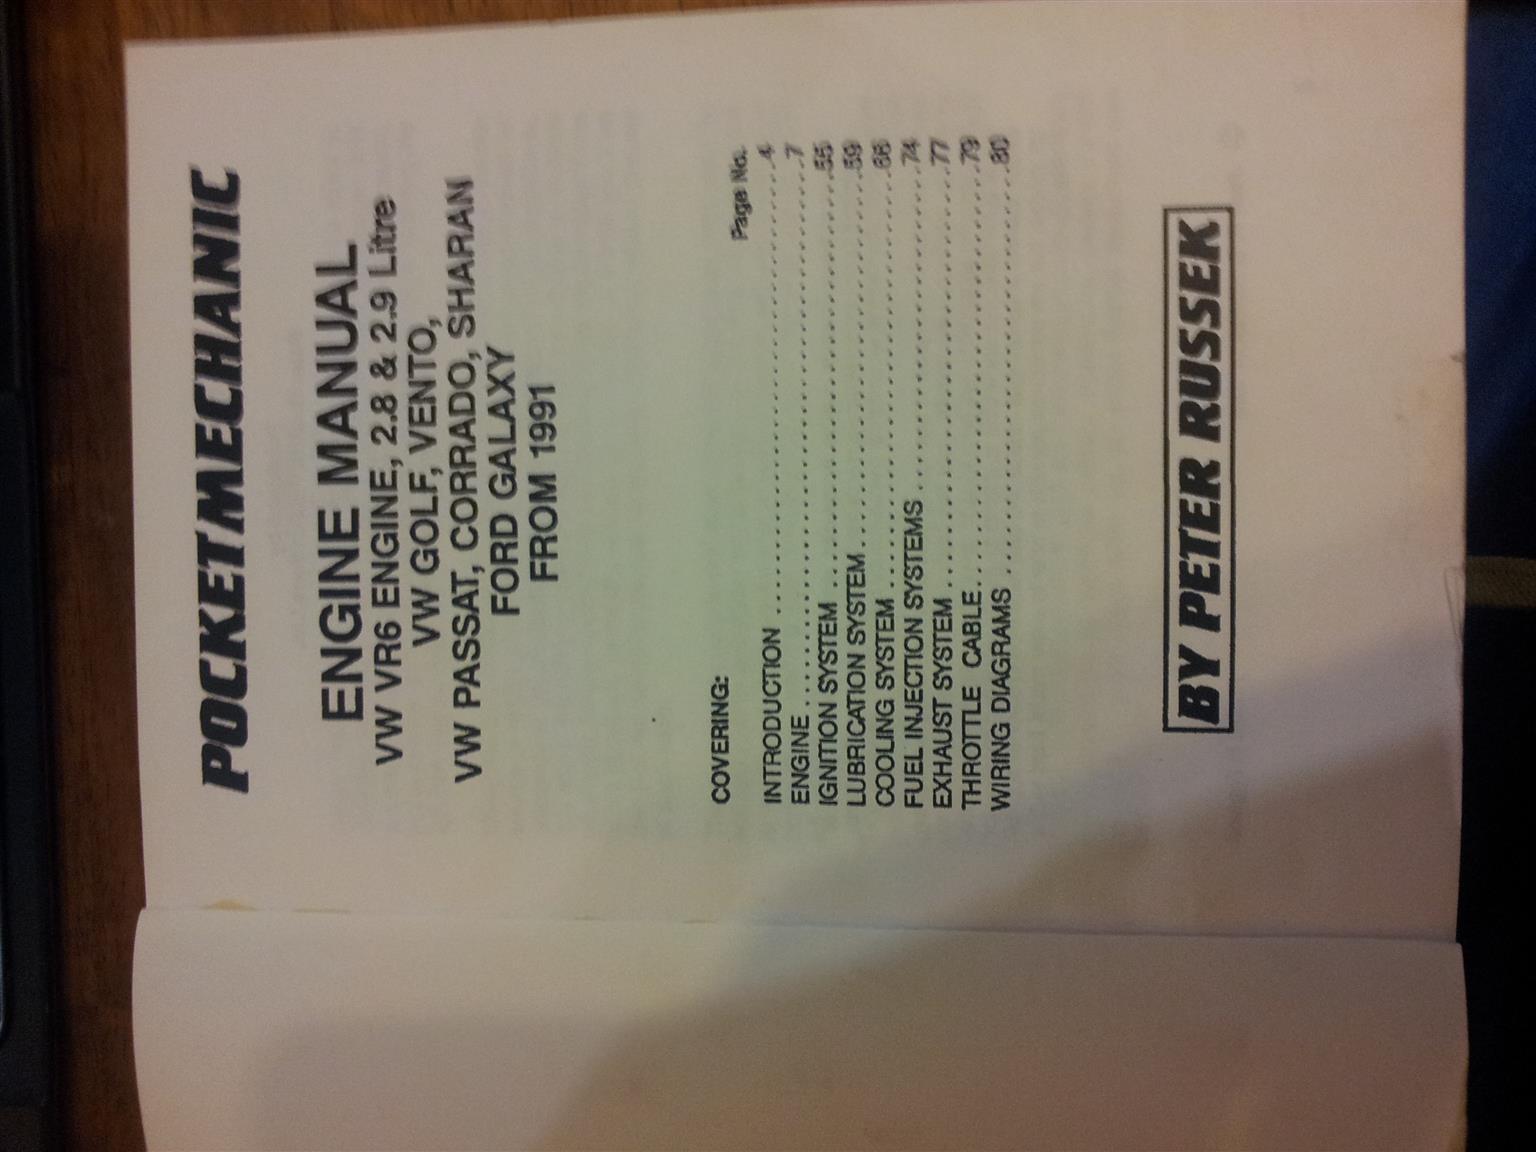 Vw Vr6 Engine Pocket Mechanic Repair Manual Peter Russek Imported Vento Wiring Diagram Edition